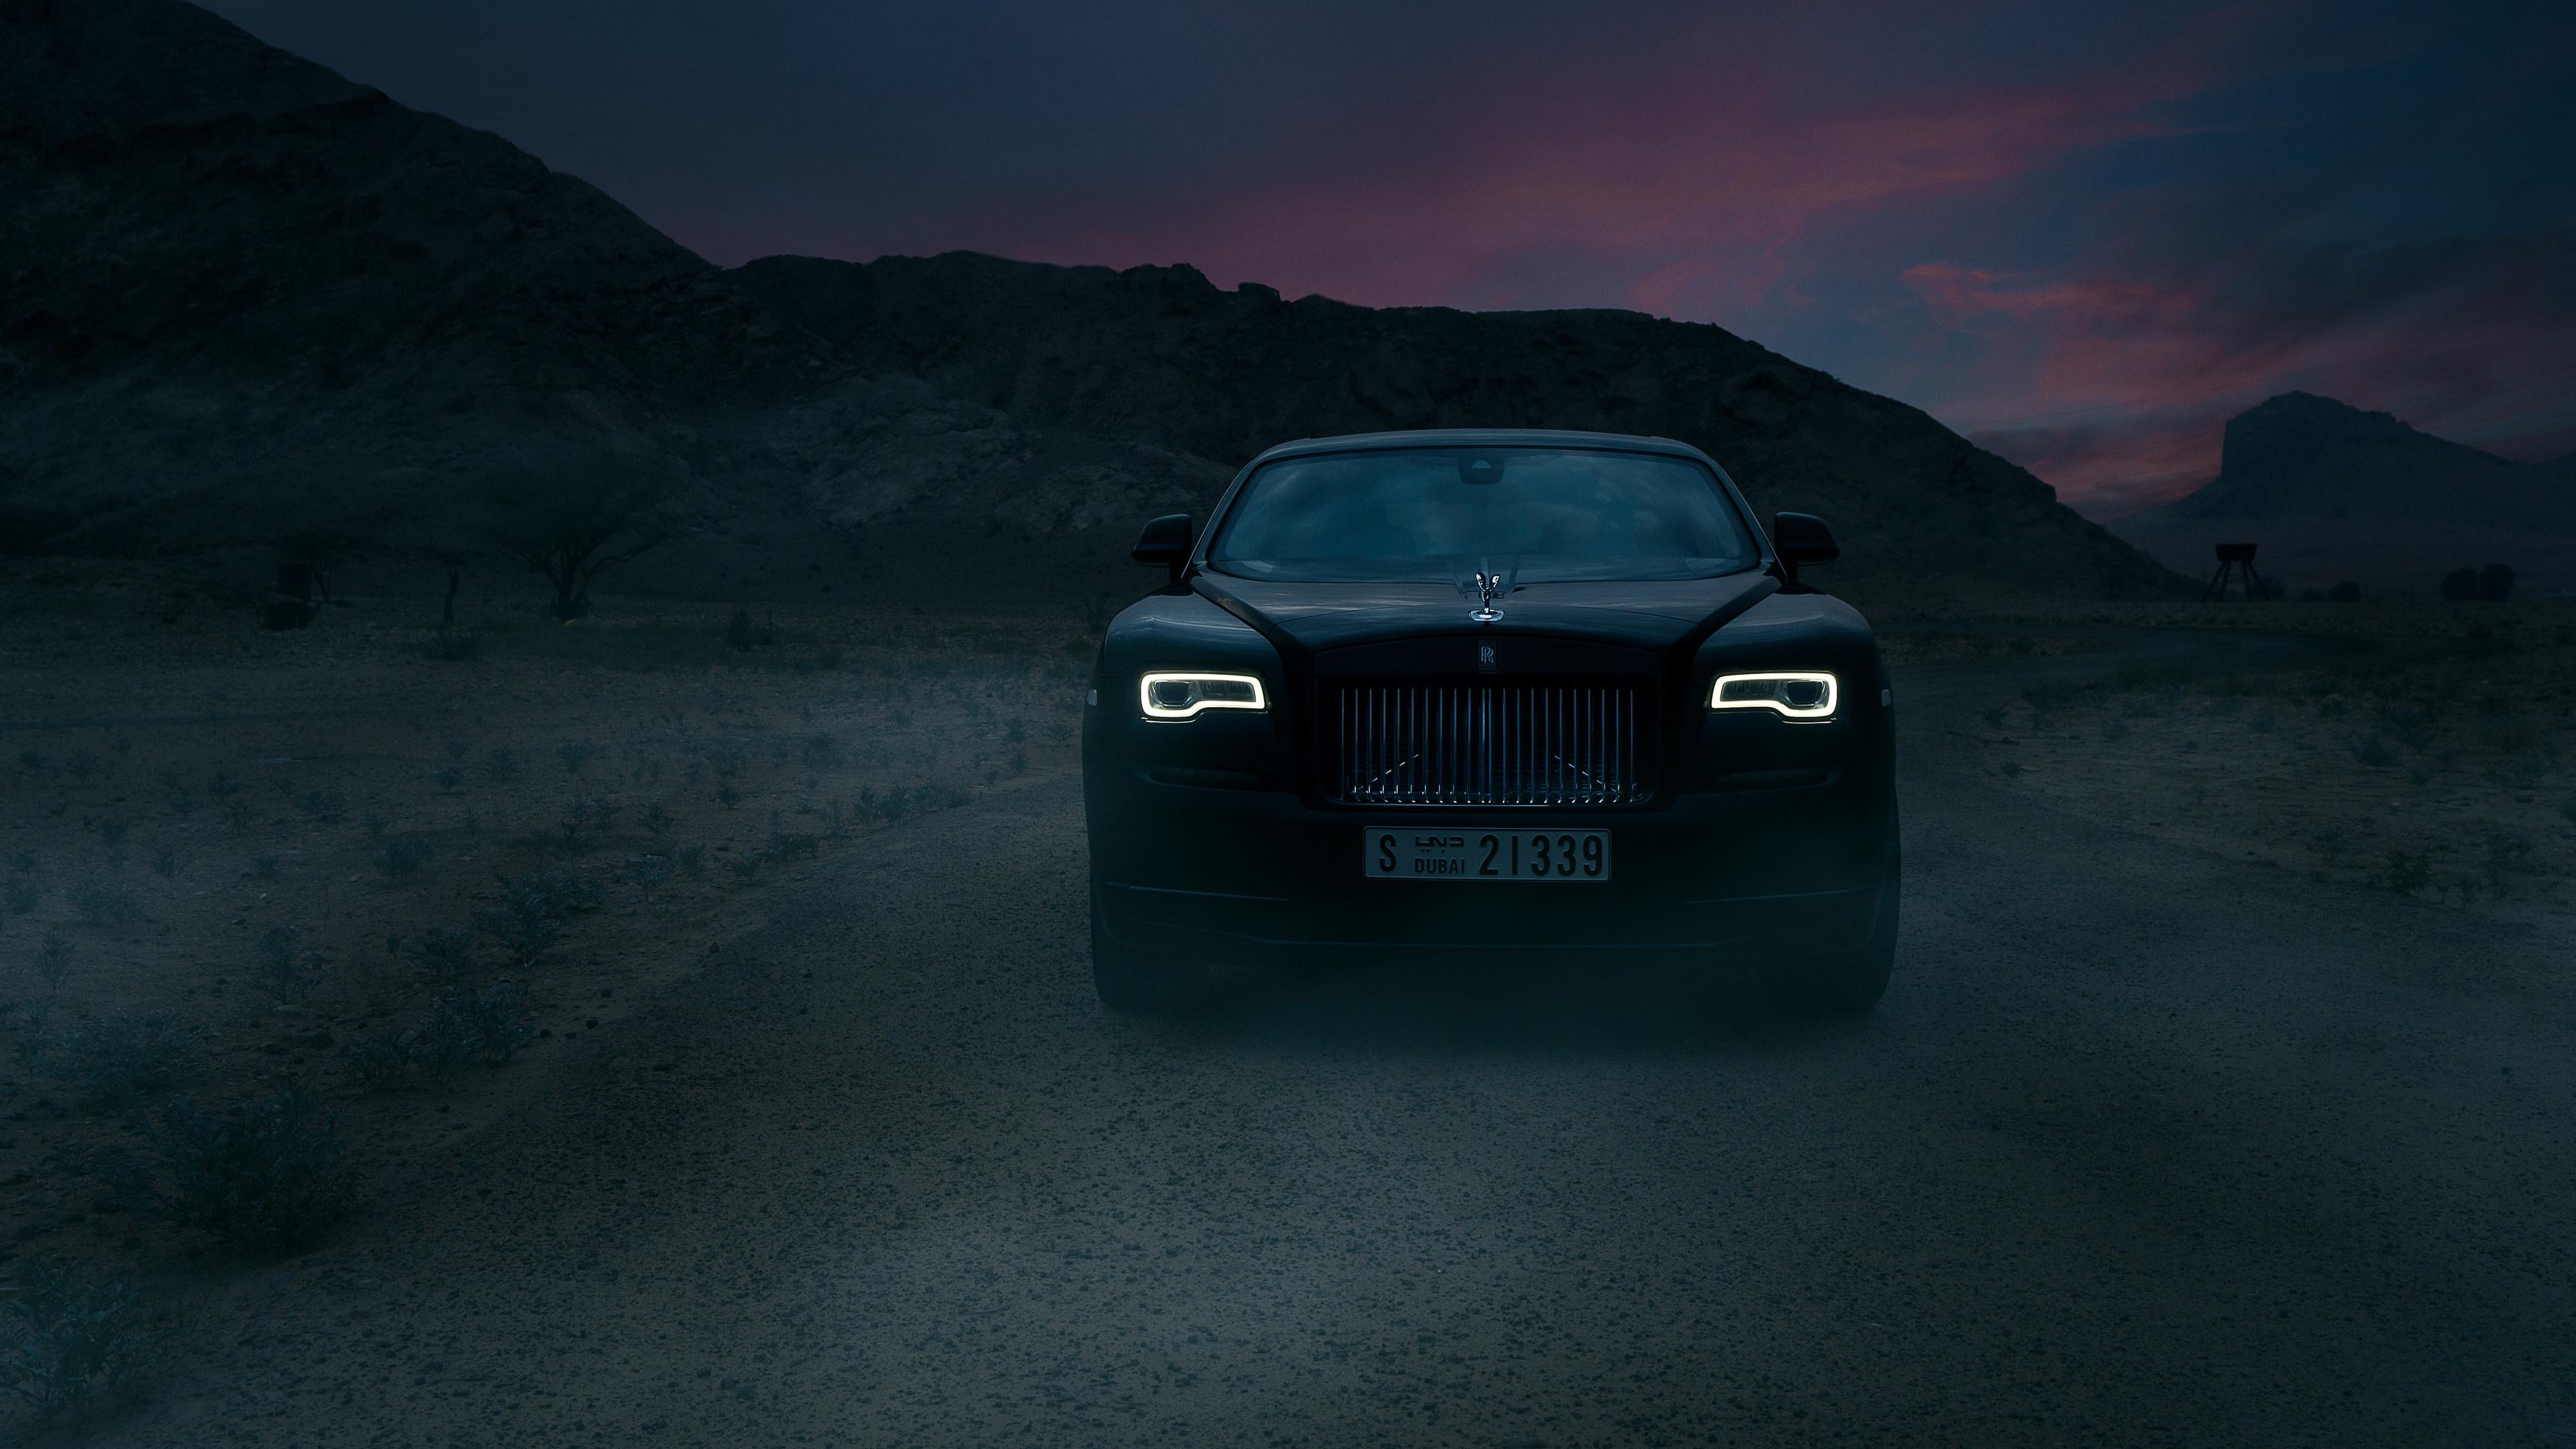 rolls royce wraith black badge 1539114258 - Rolls Royce Wraith Black Badge - rolls royce wraith wallpapers, rolls royce wallpapers, hd-wallpapers, dark wallpapers, cars wallpapers, behance wallpapers, 4k-wallpapers